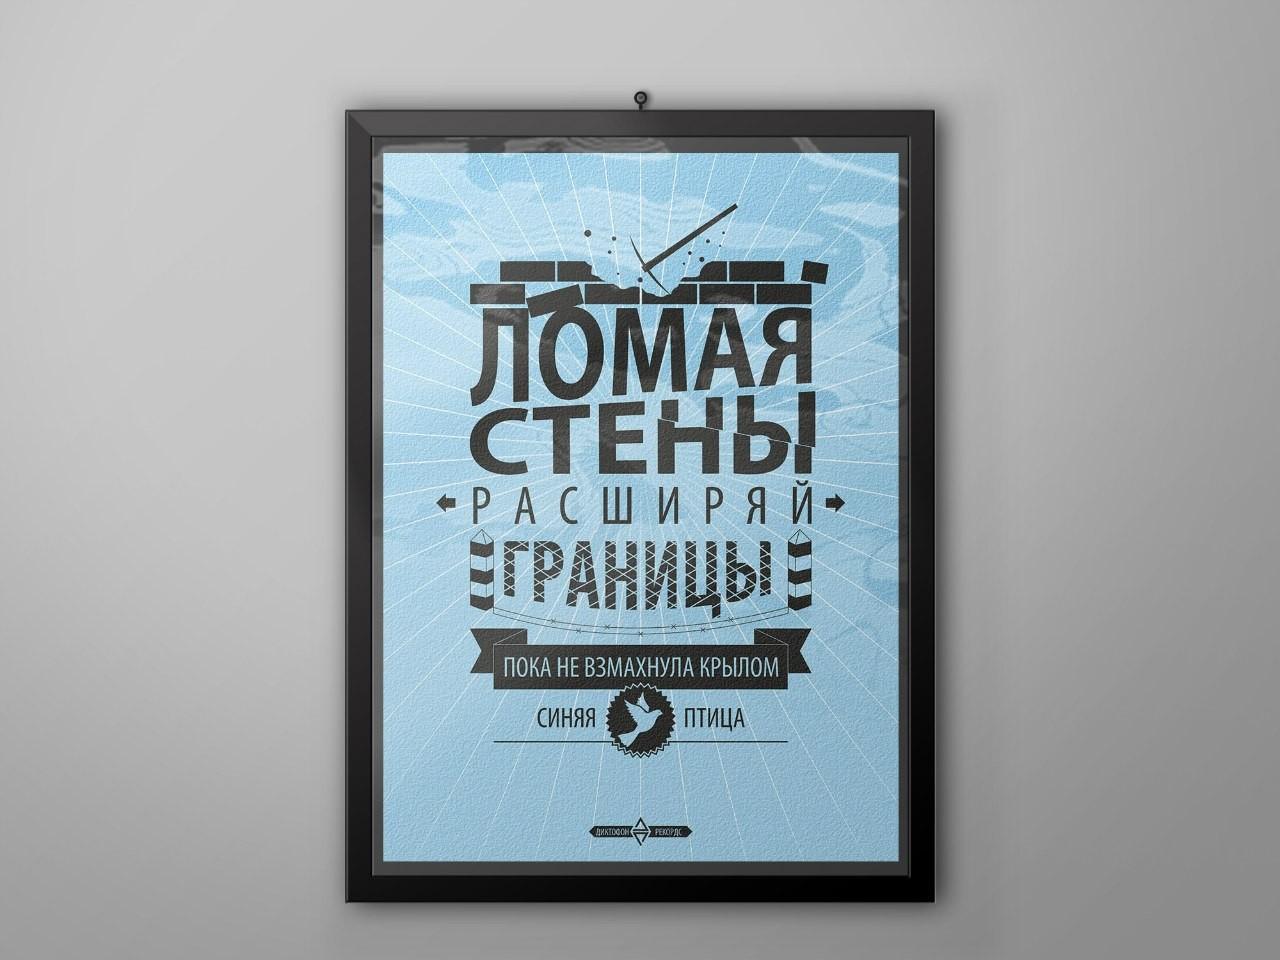 мотивирующие плакаты картинки презентация представляет сведения